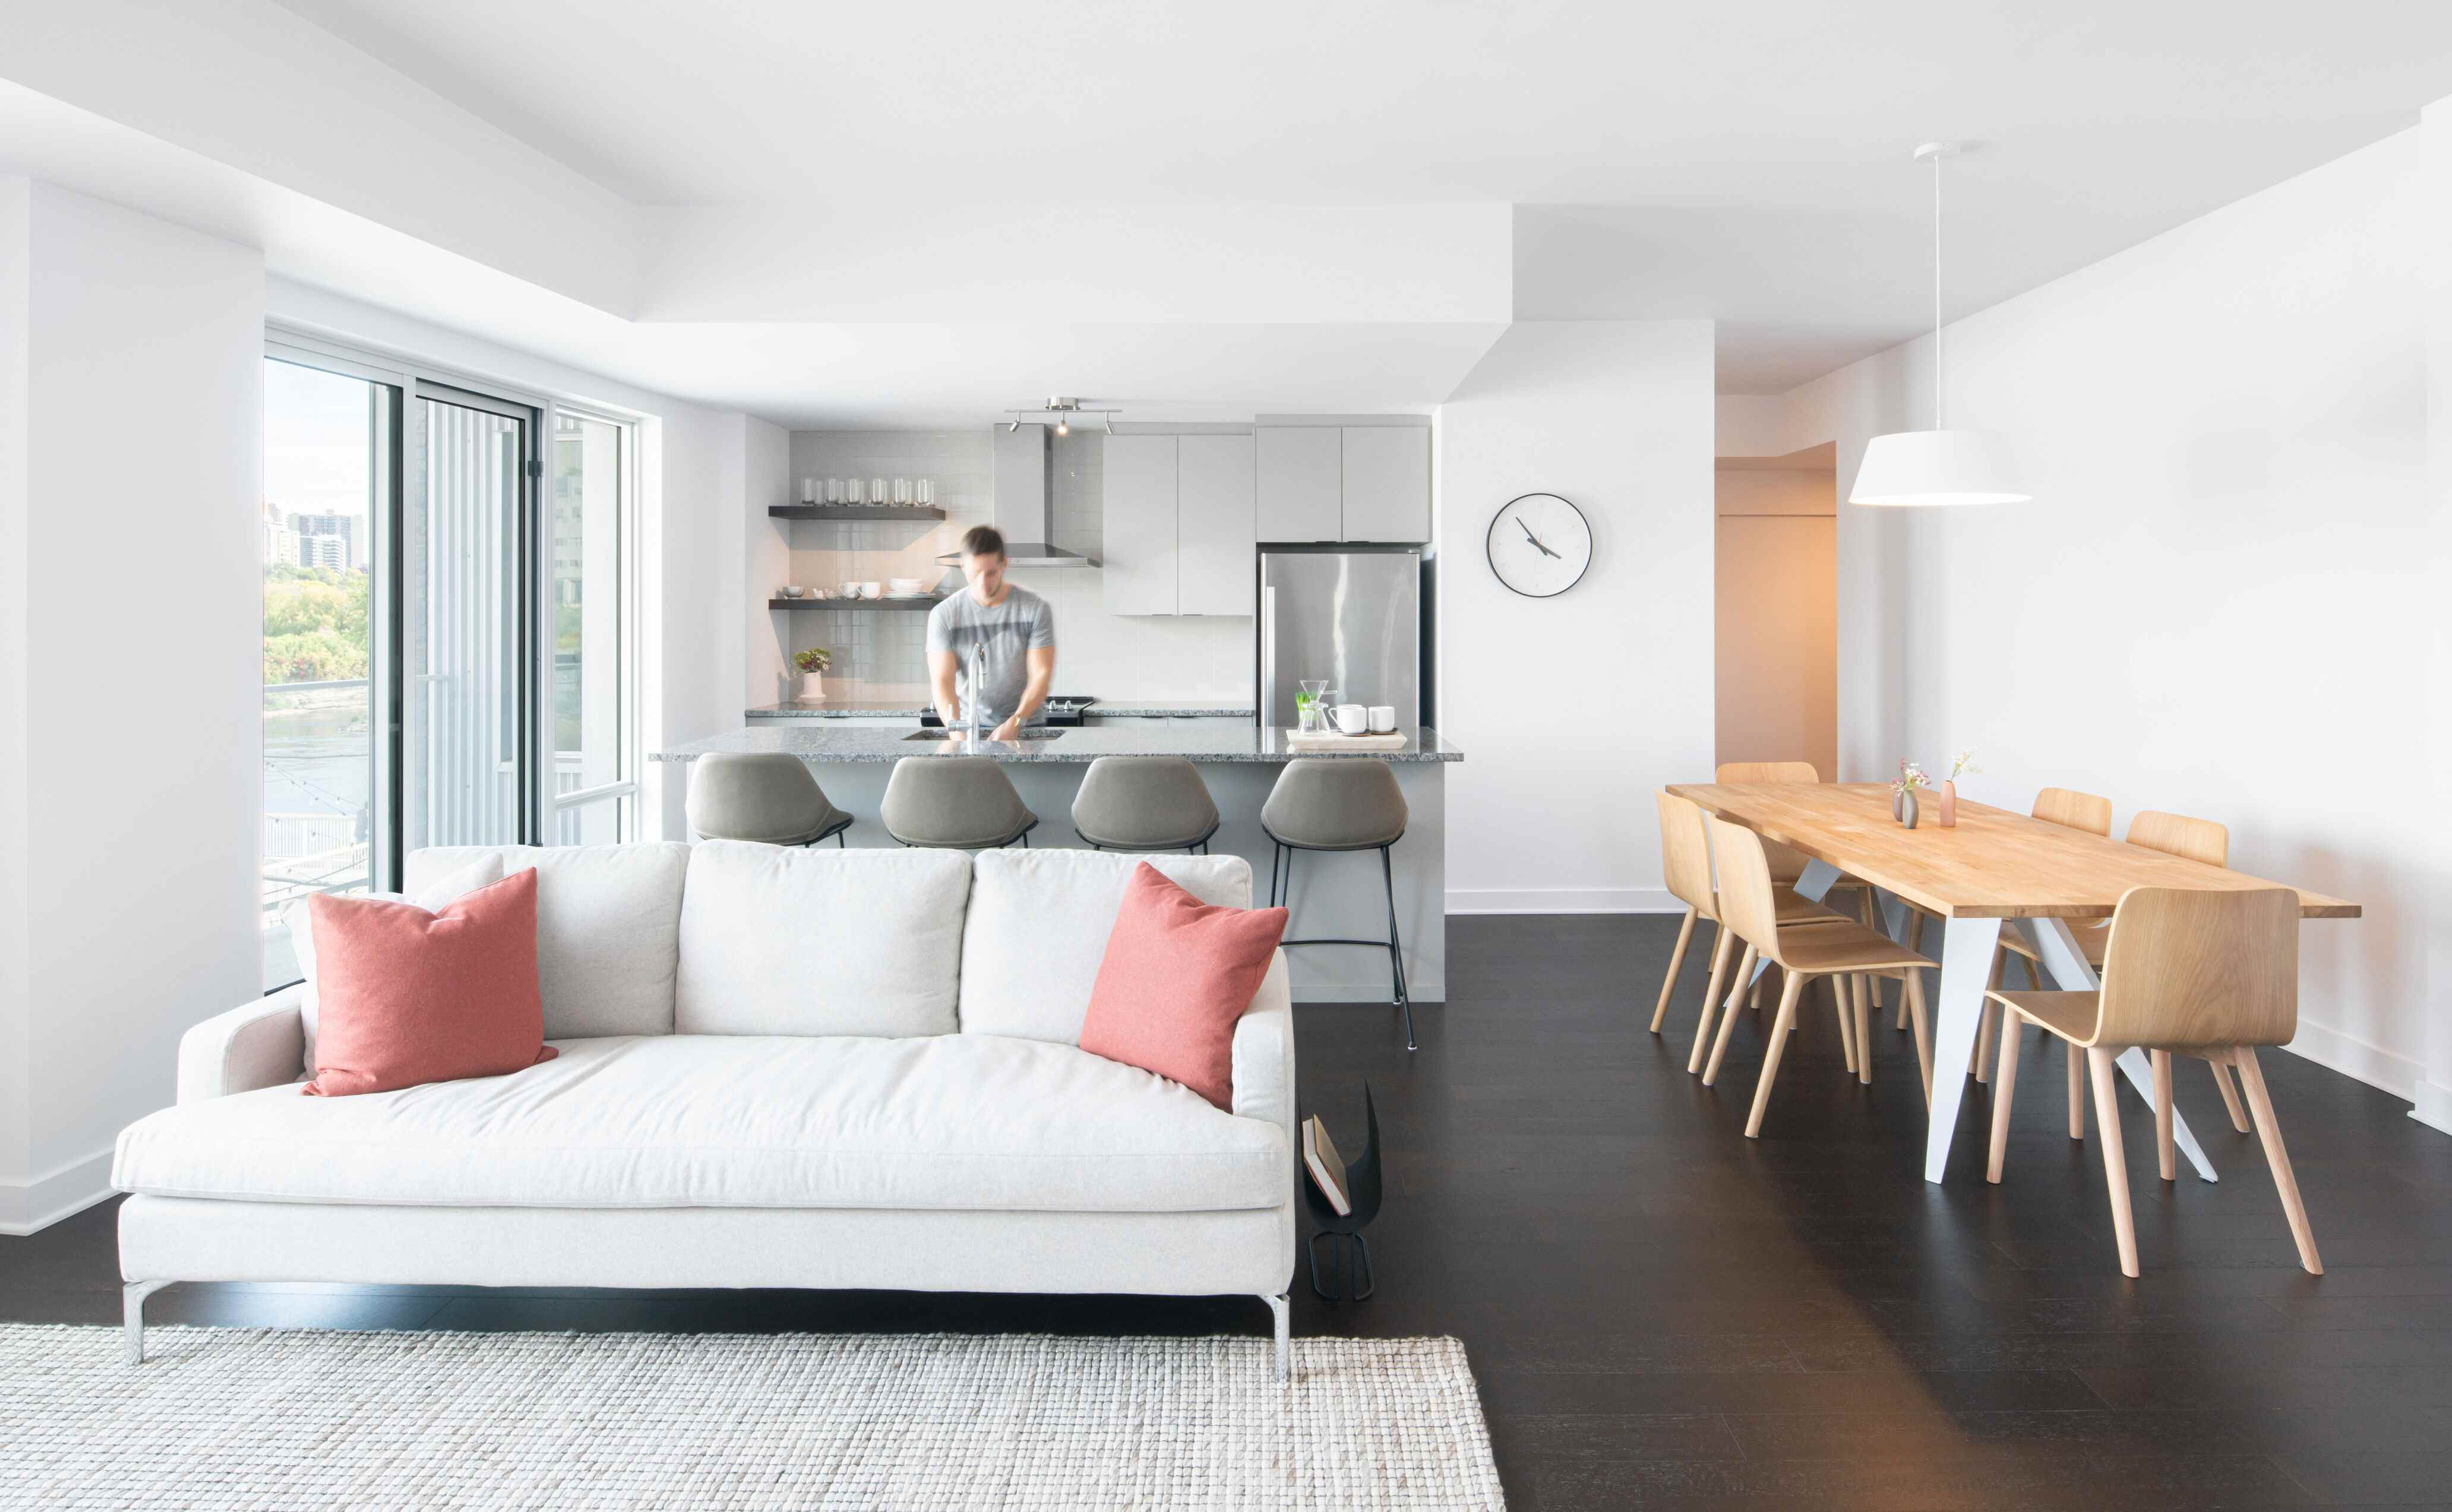 ZibiO_Kitchen_LivingRoom